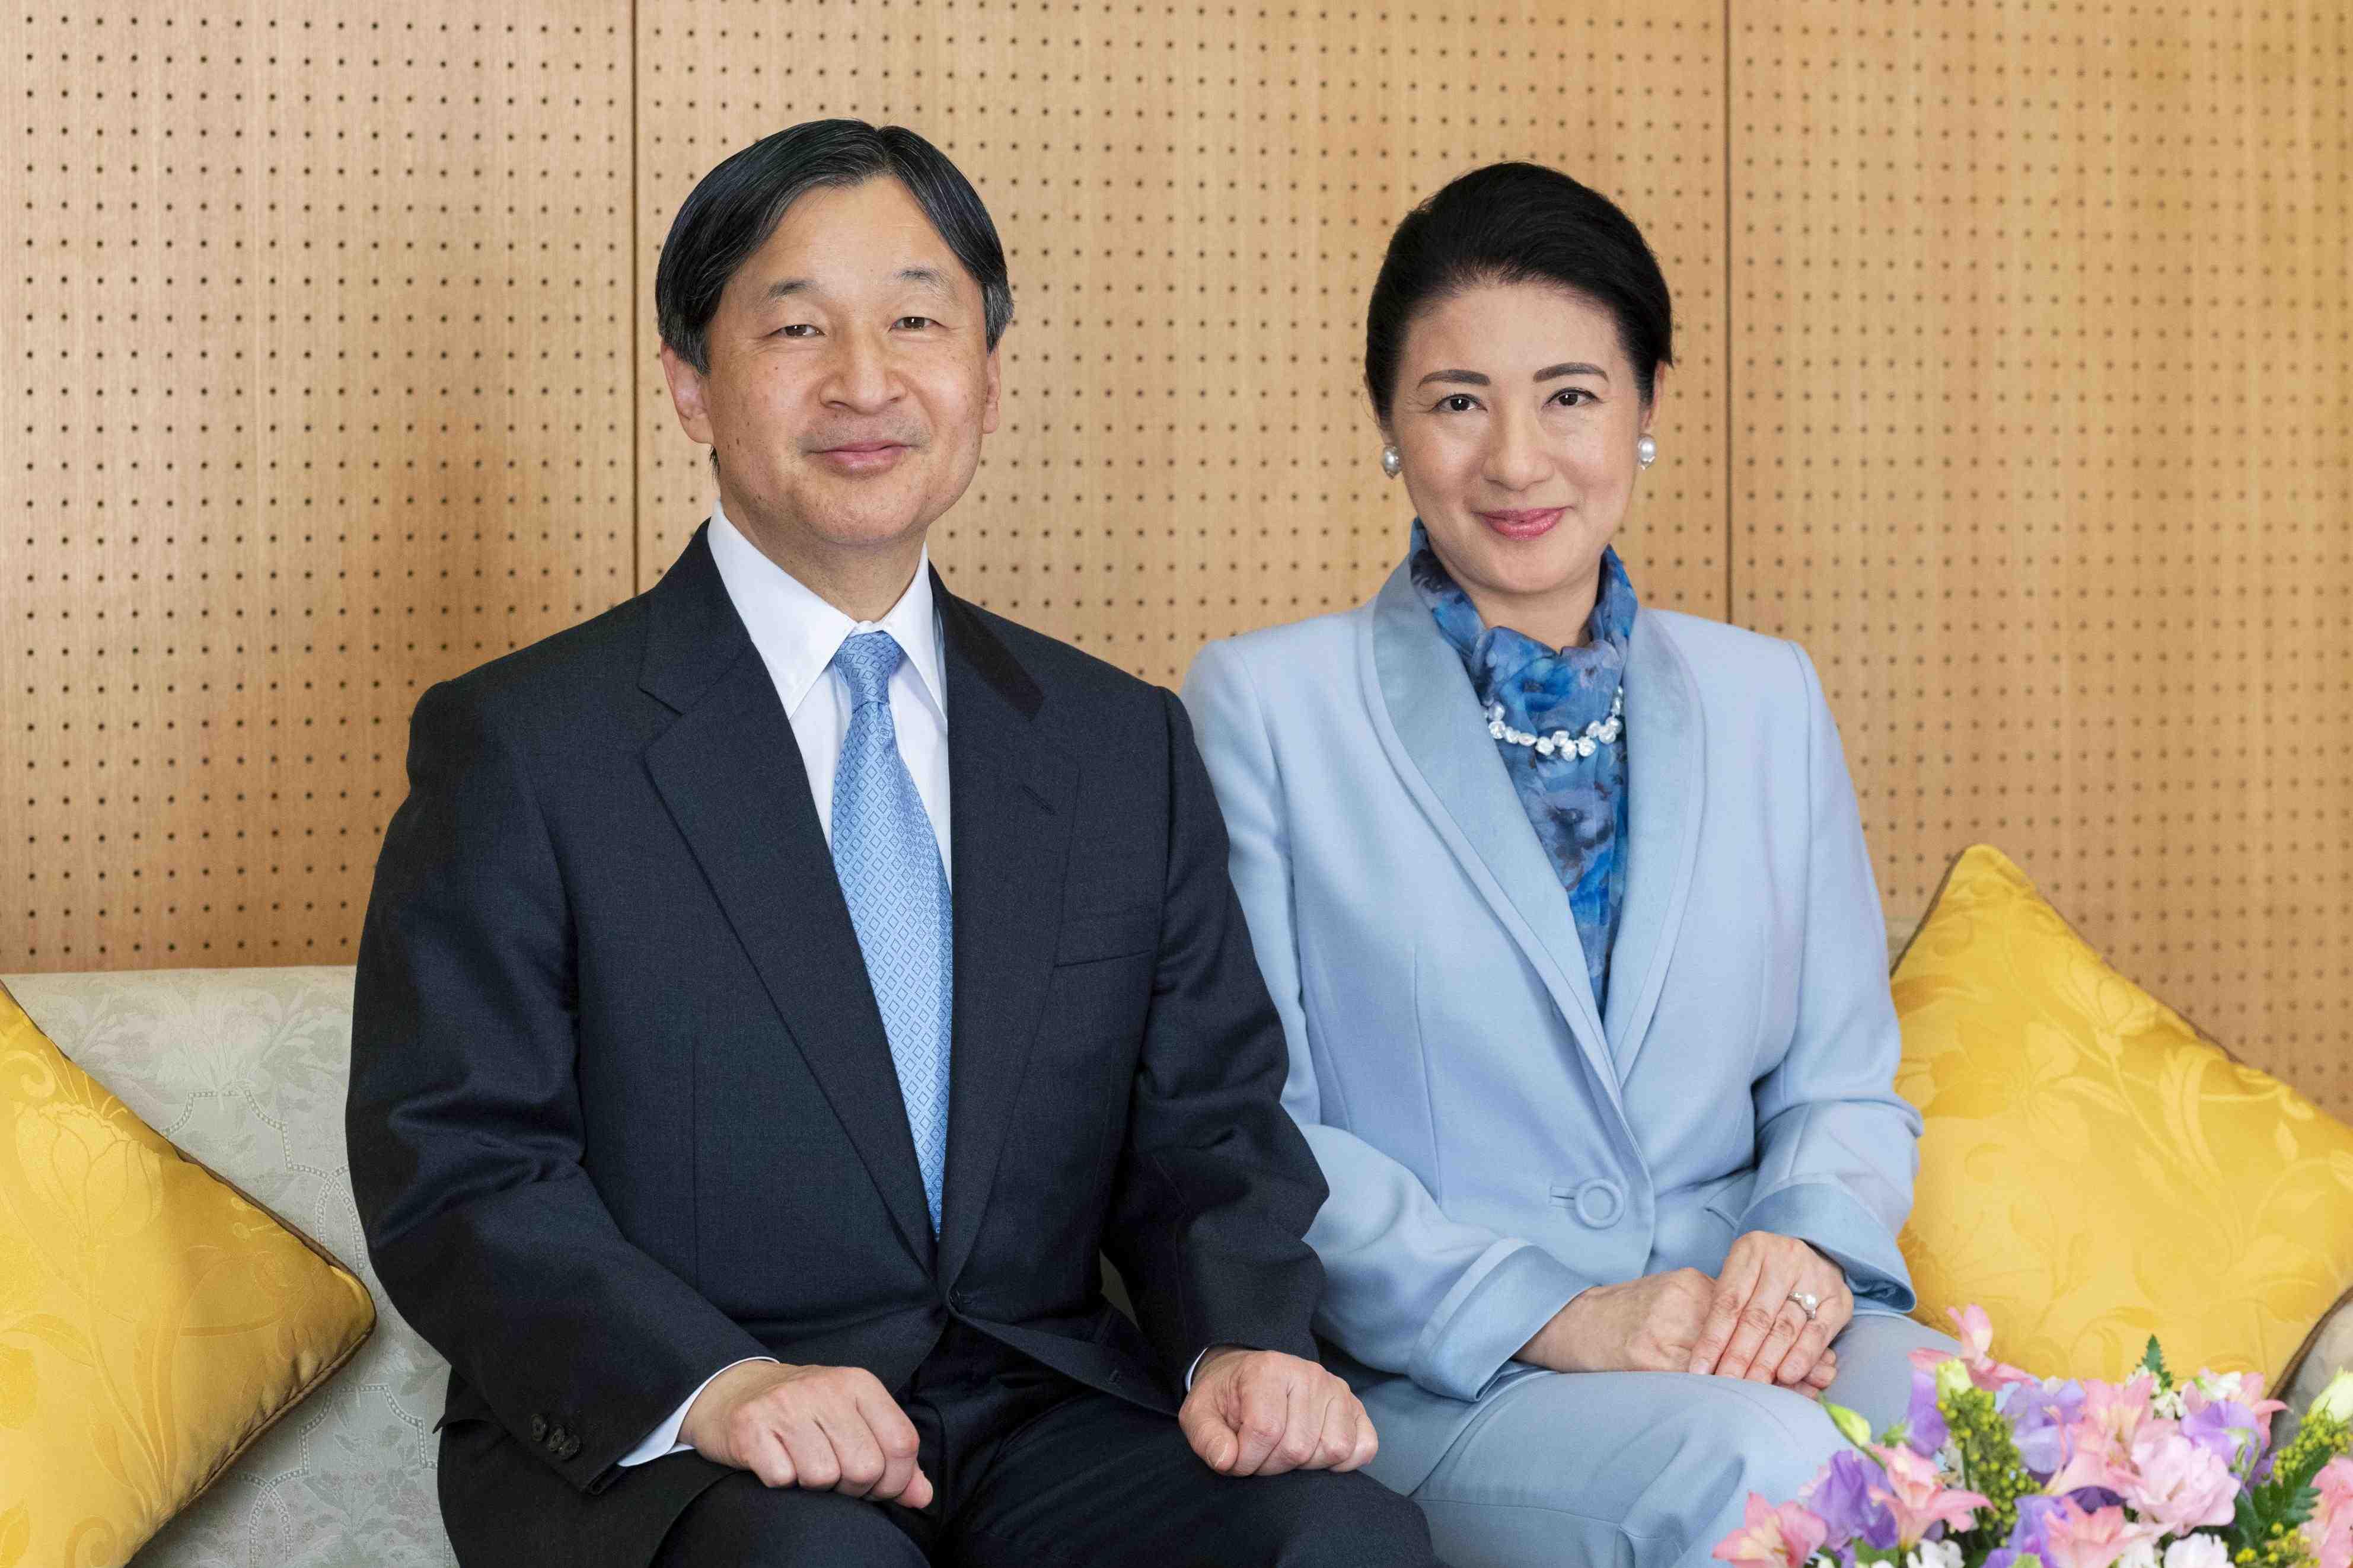 Japan Emperor 60th Birthday 005